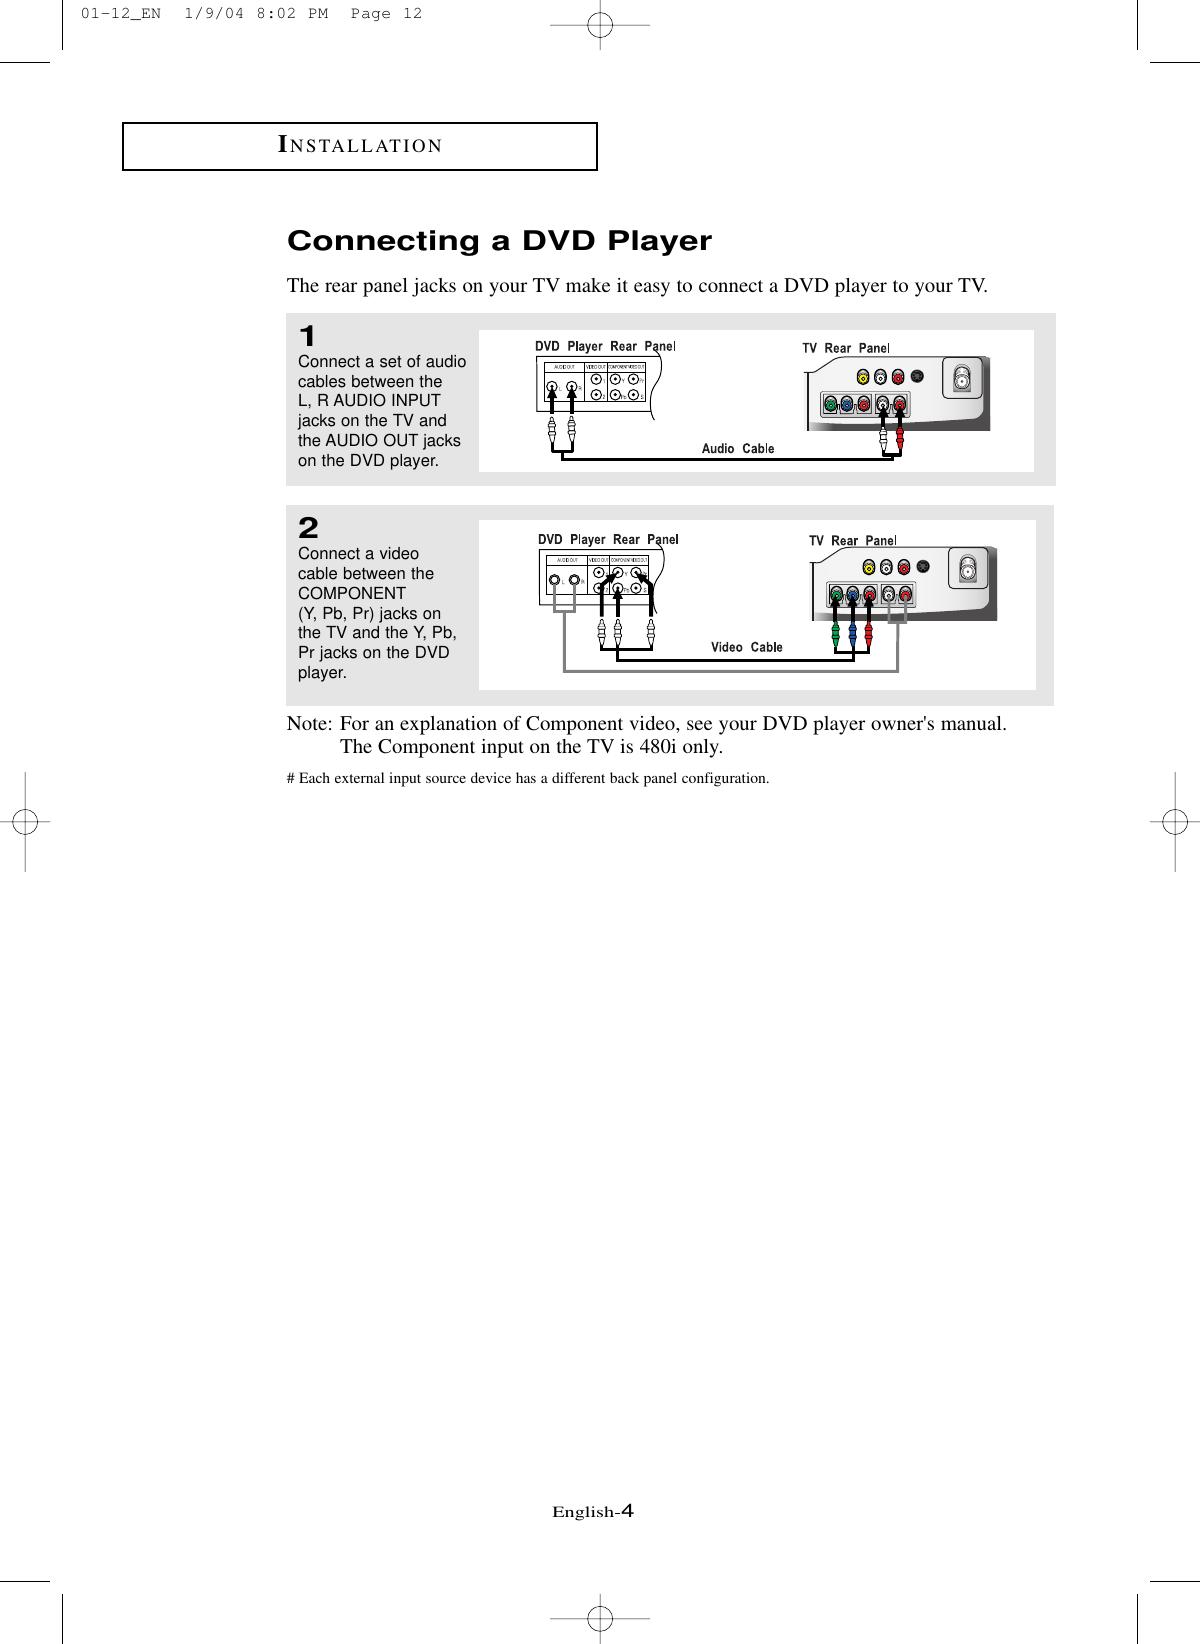 samsung 573a 02cover ltp2035 20040527131021453 qsg mu151720uo rh usermanual wiki Operation Manual Cover User Manual